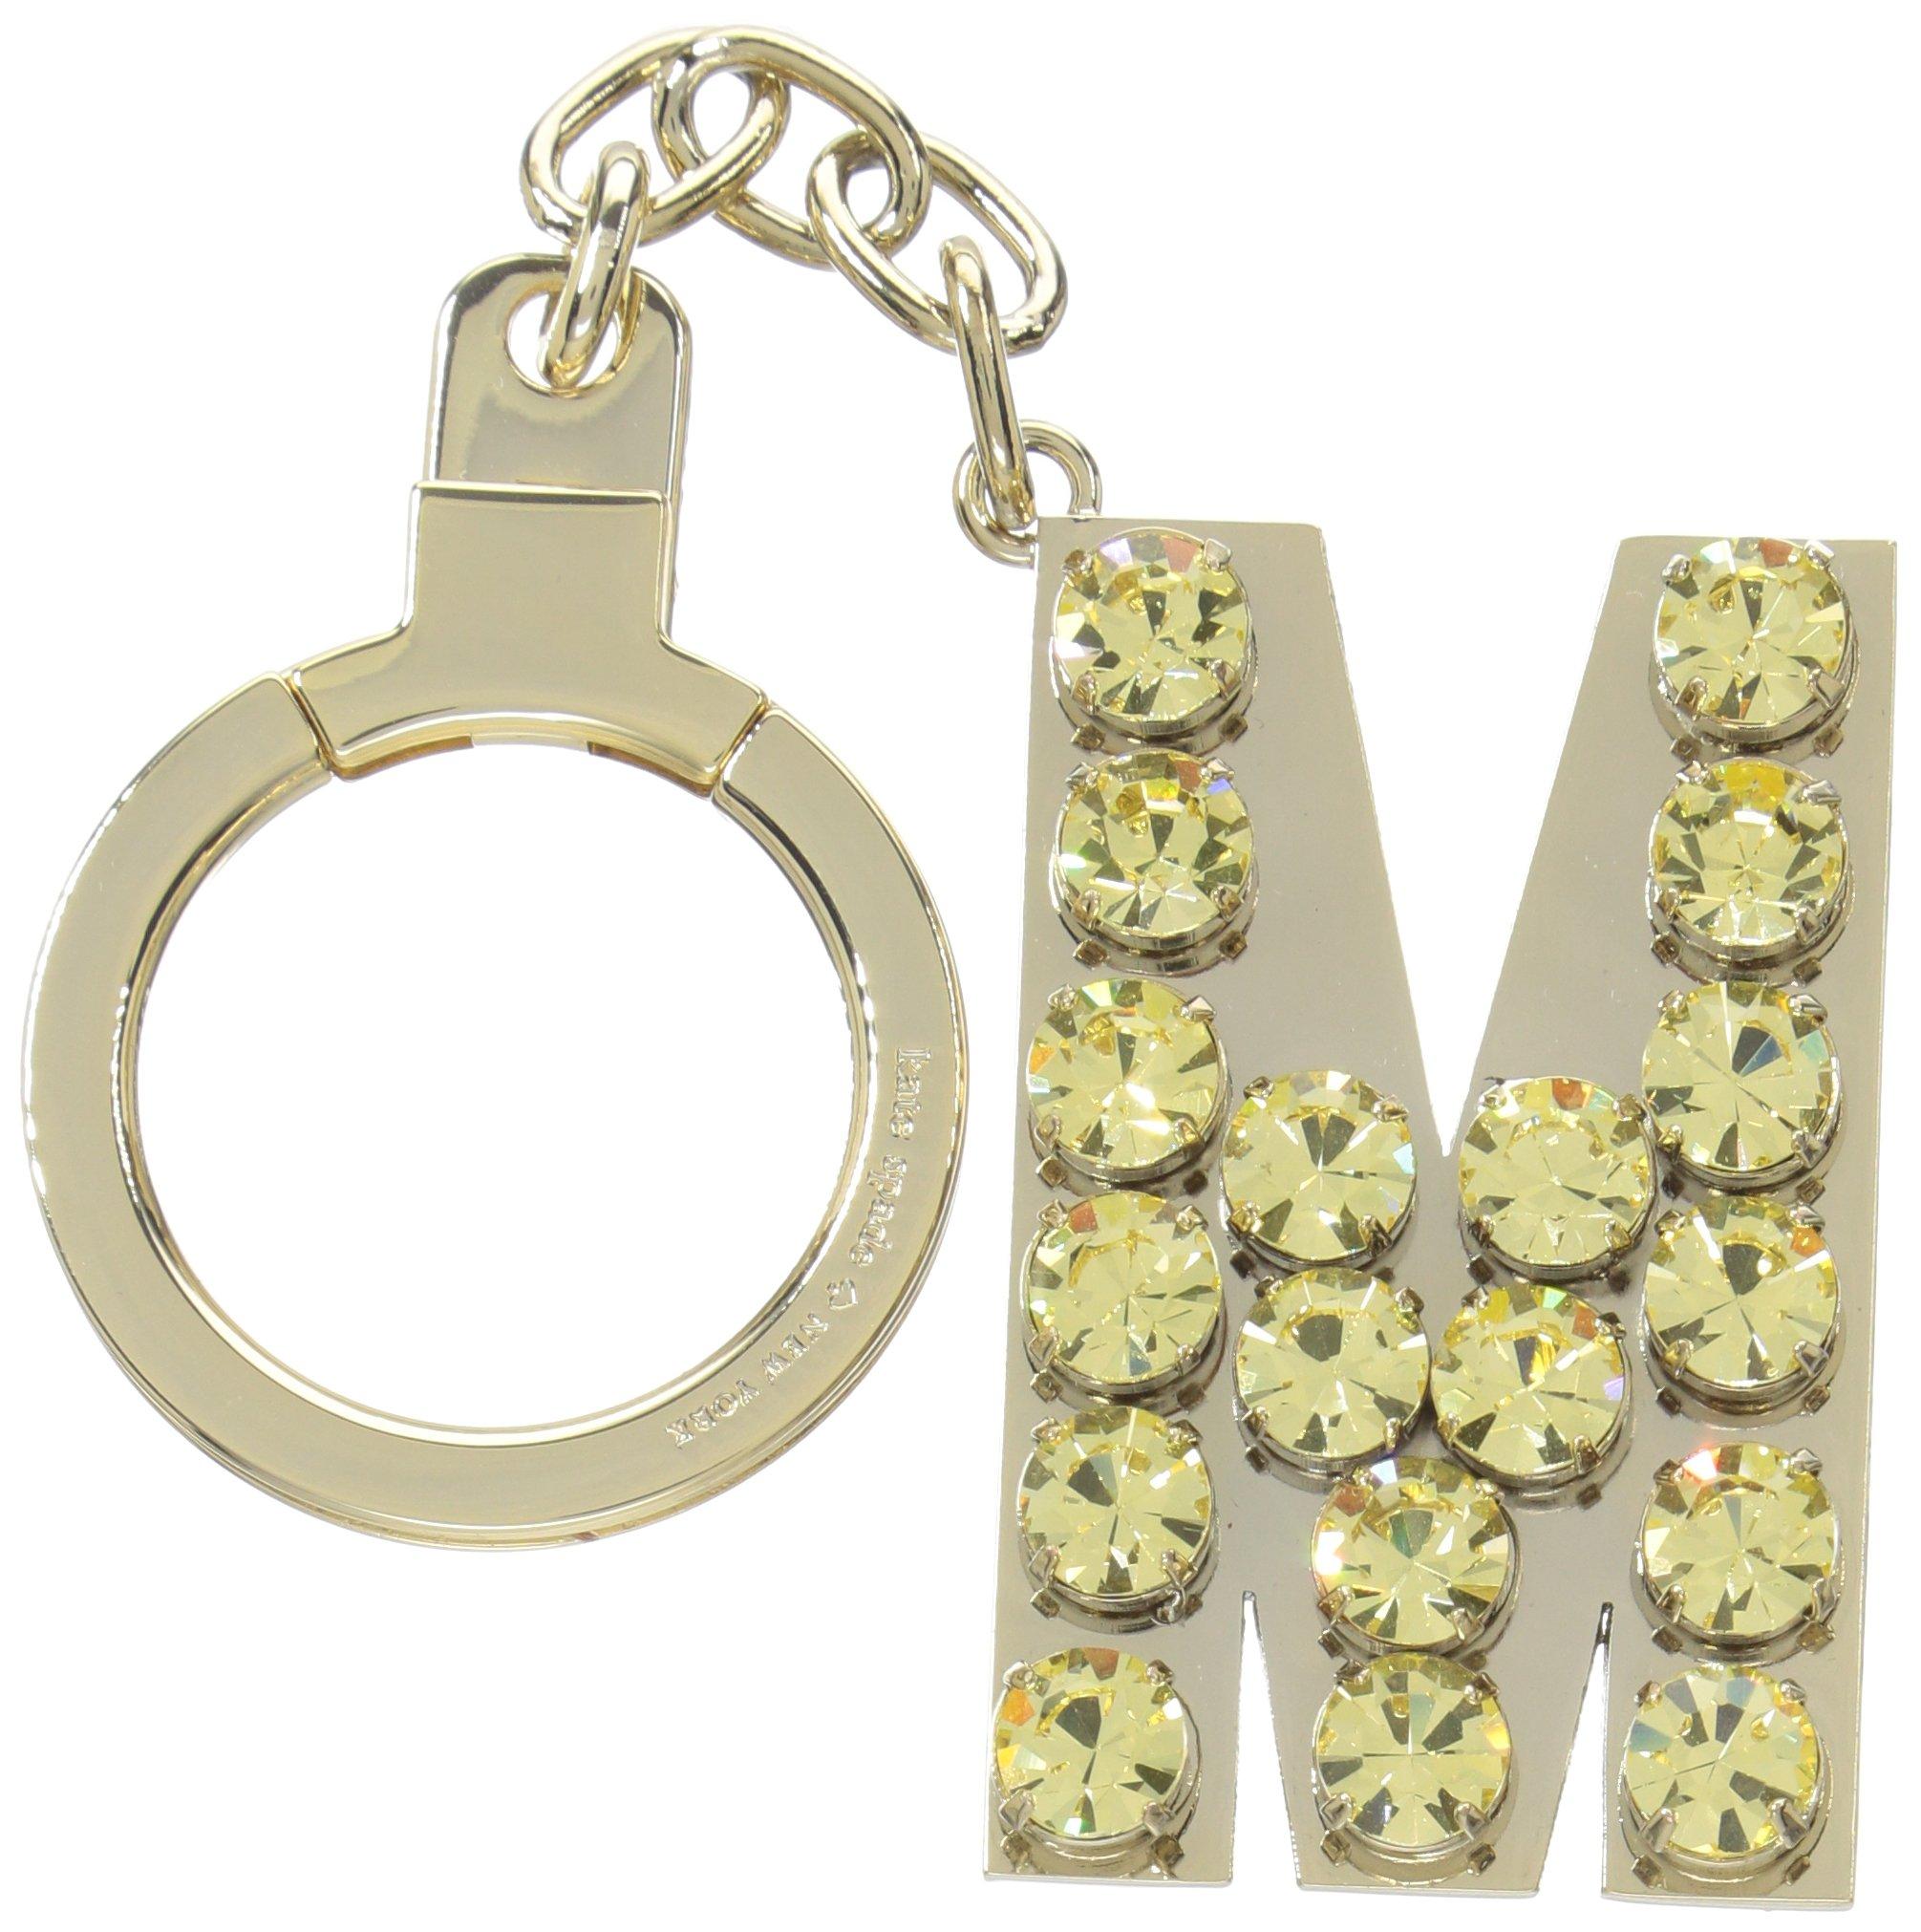 kate spade new york Kate Spade Key Fobs Jeweled M Initial, Yellow